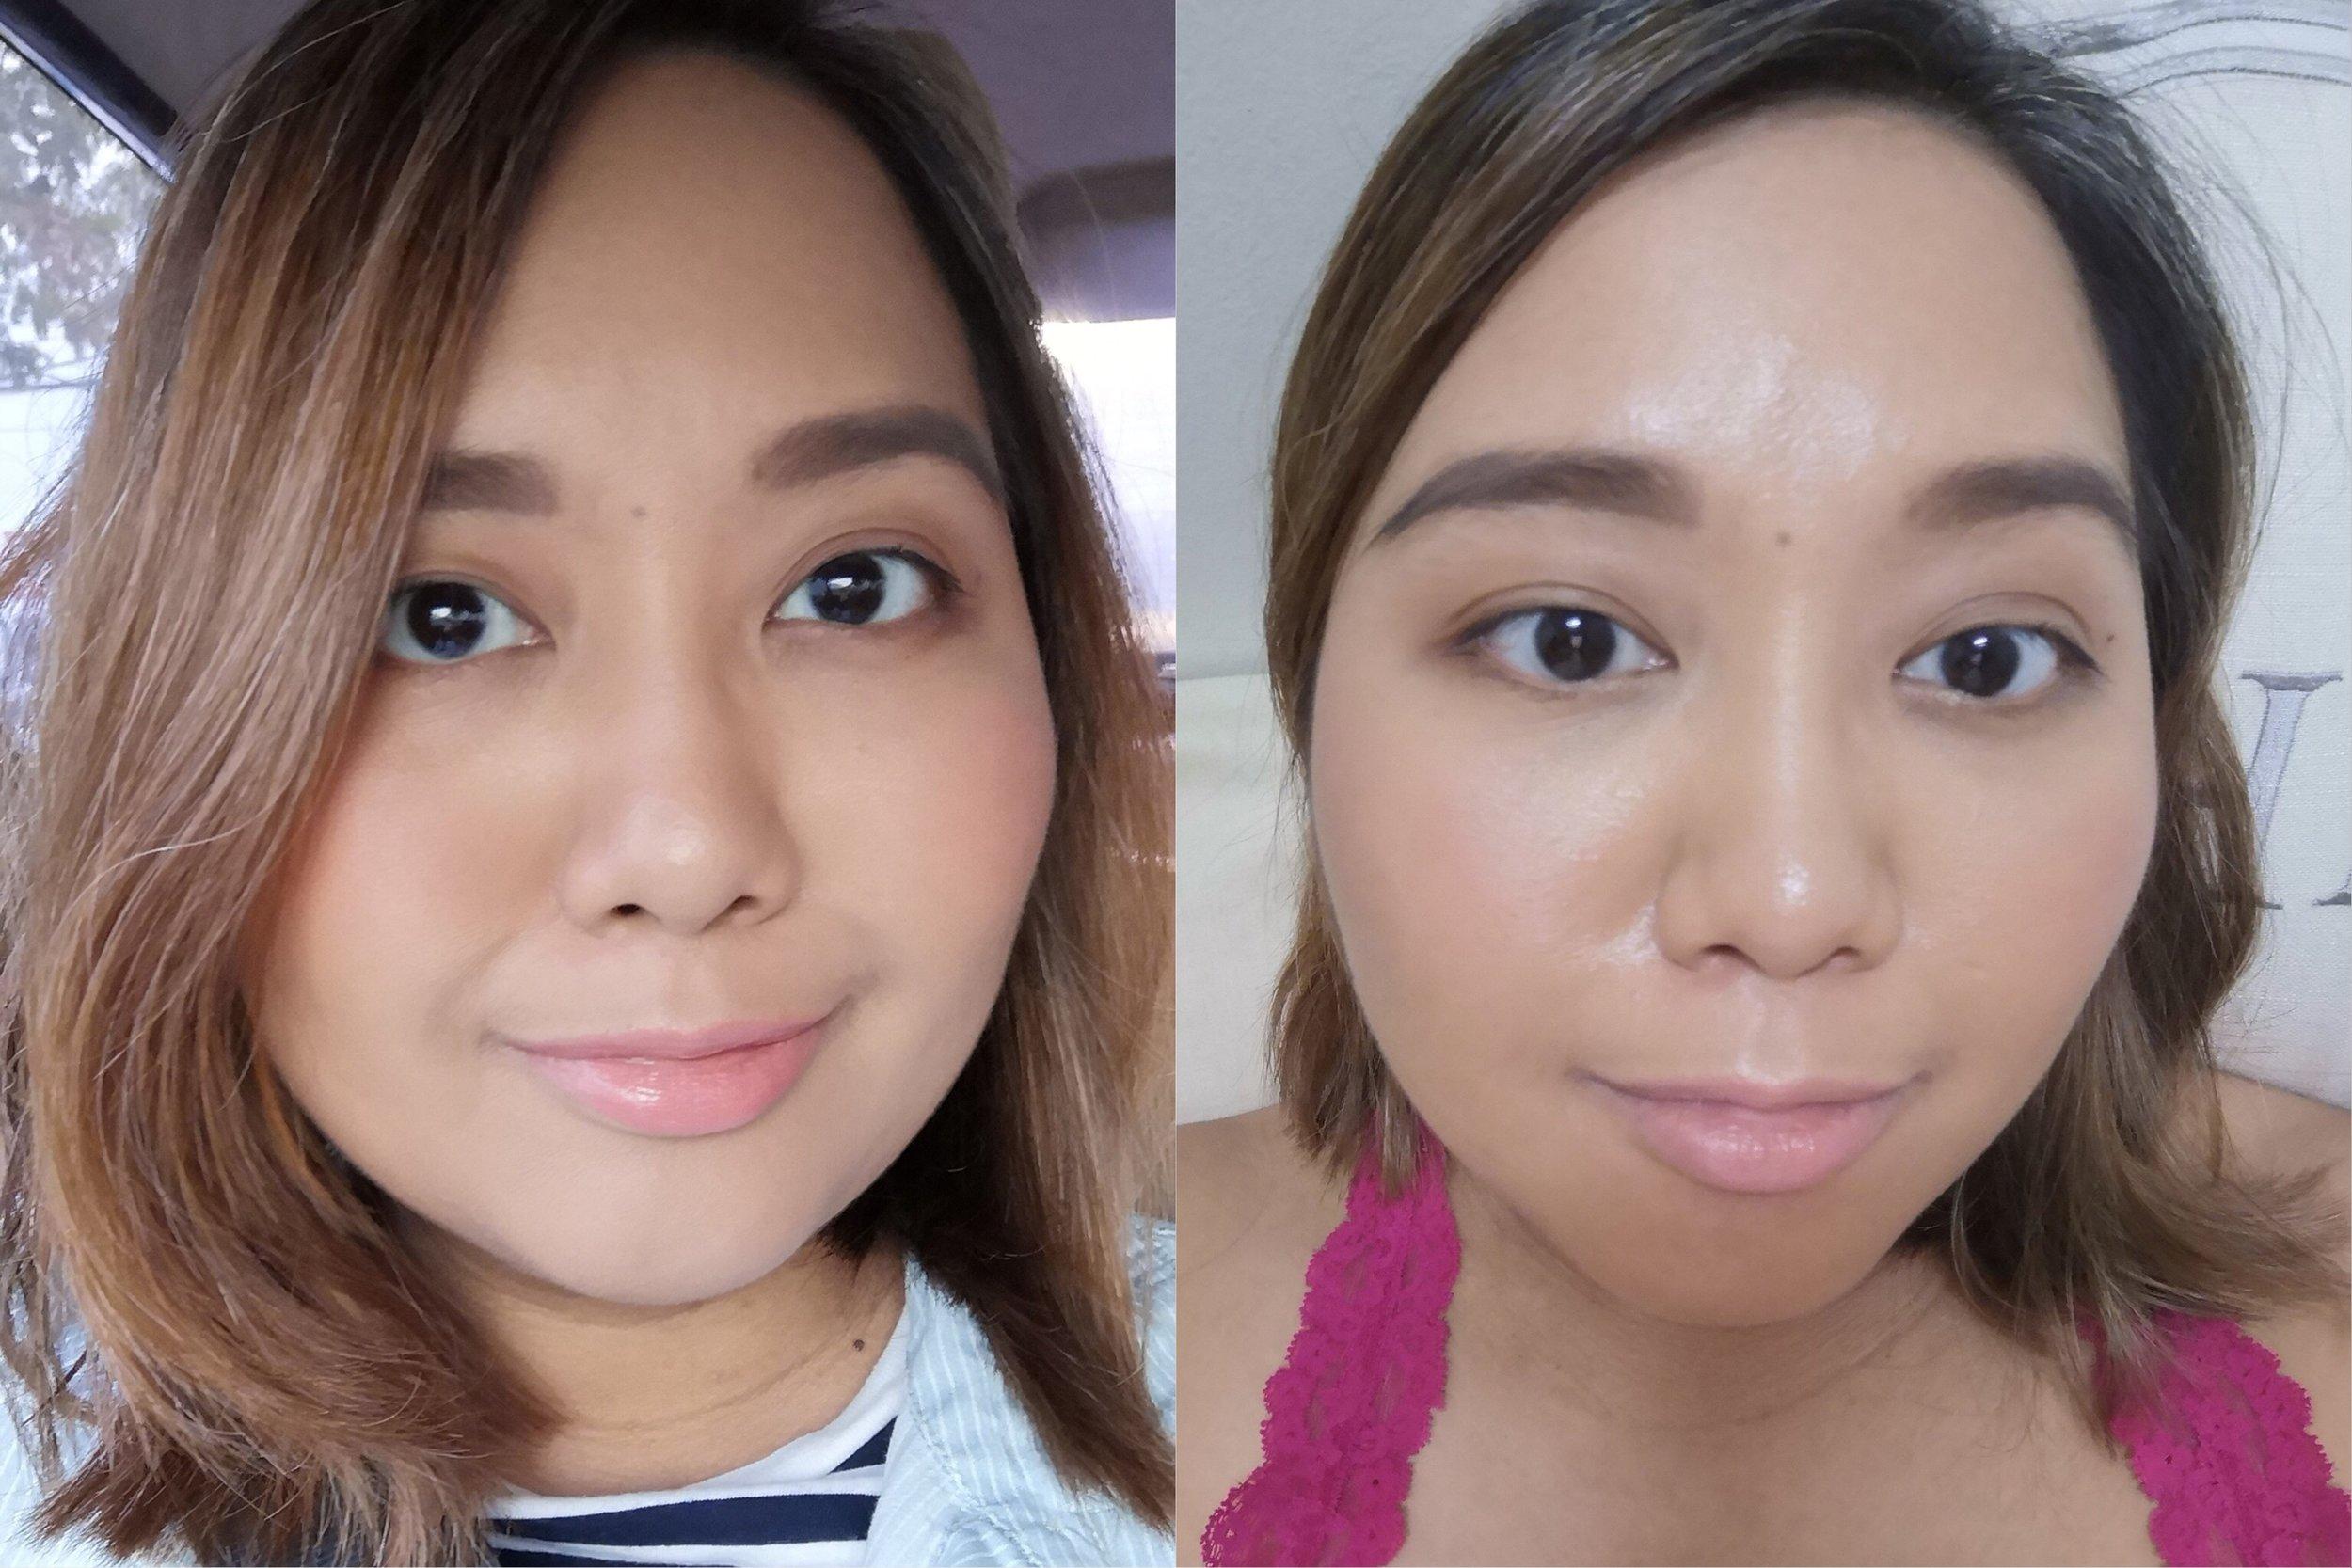 Left: Wearing makeup in natural lighting; Right: After 7 hours of wear in indoor lighting